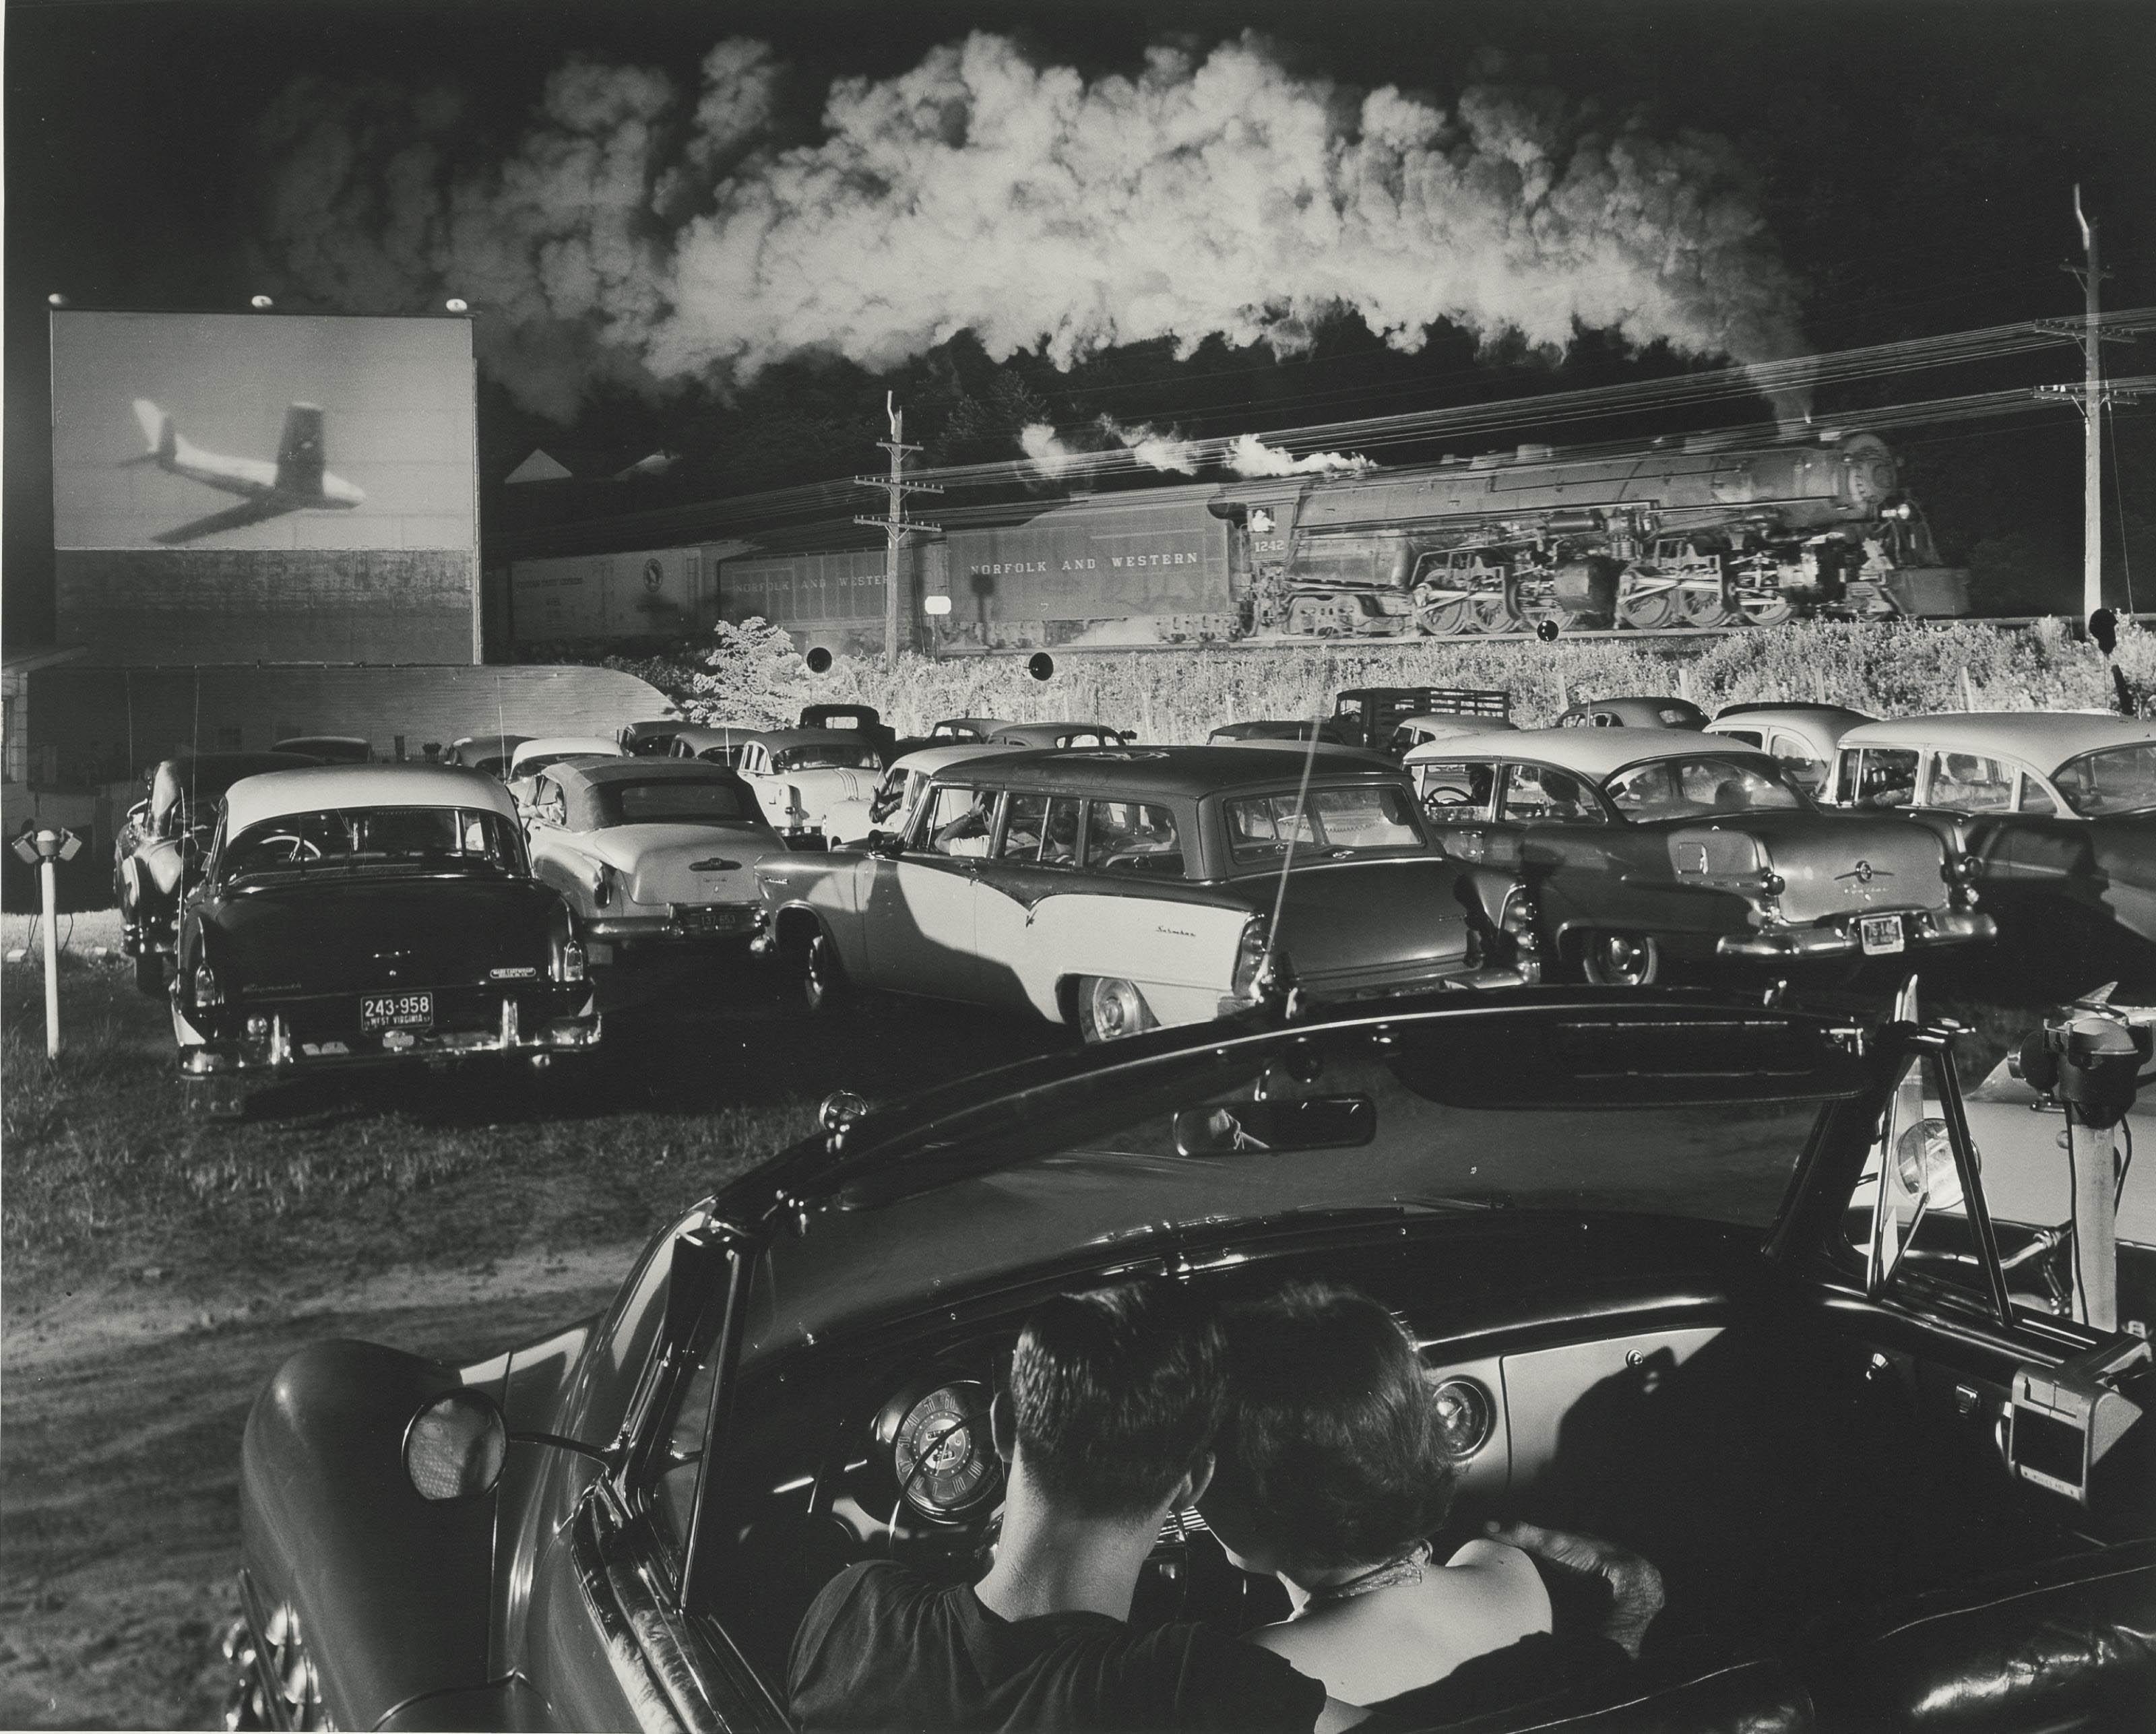 'Hotshot', Eastbound, Iager, West Virginia, 1956